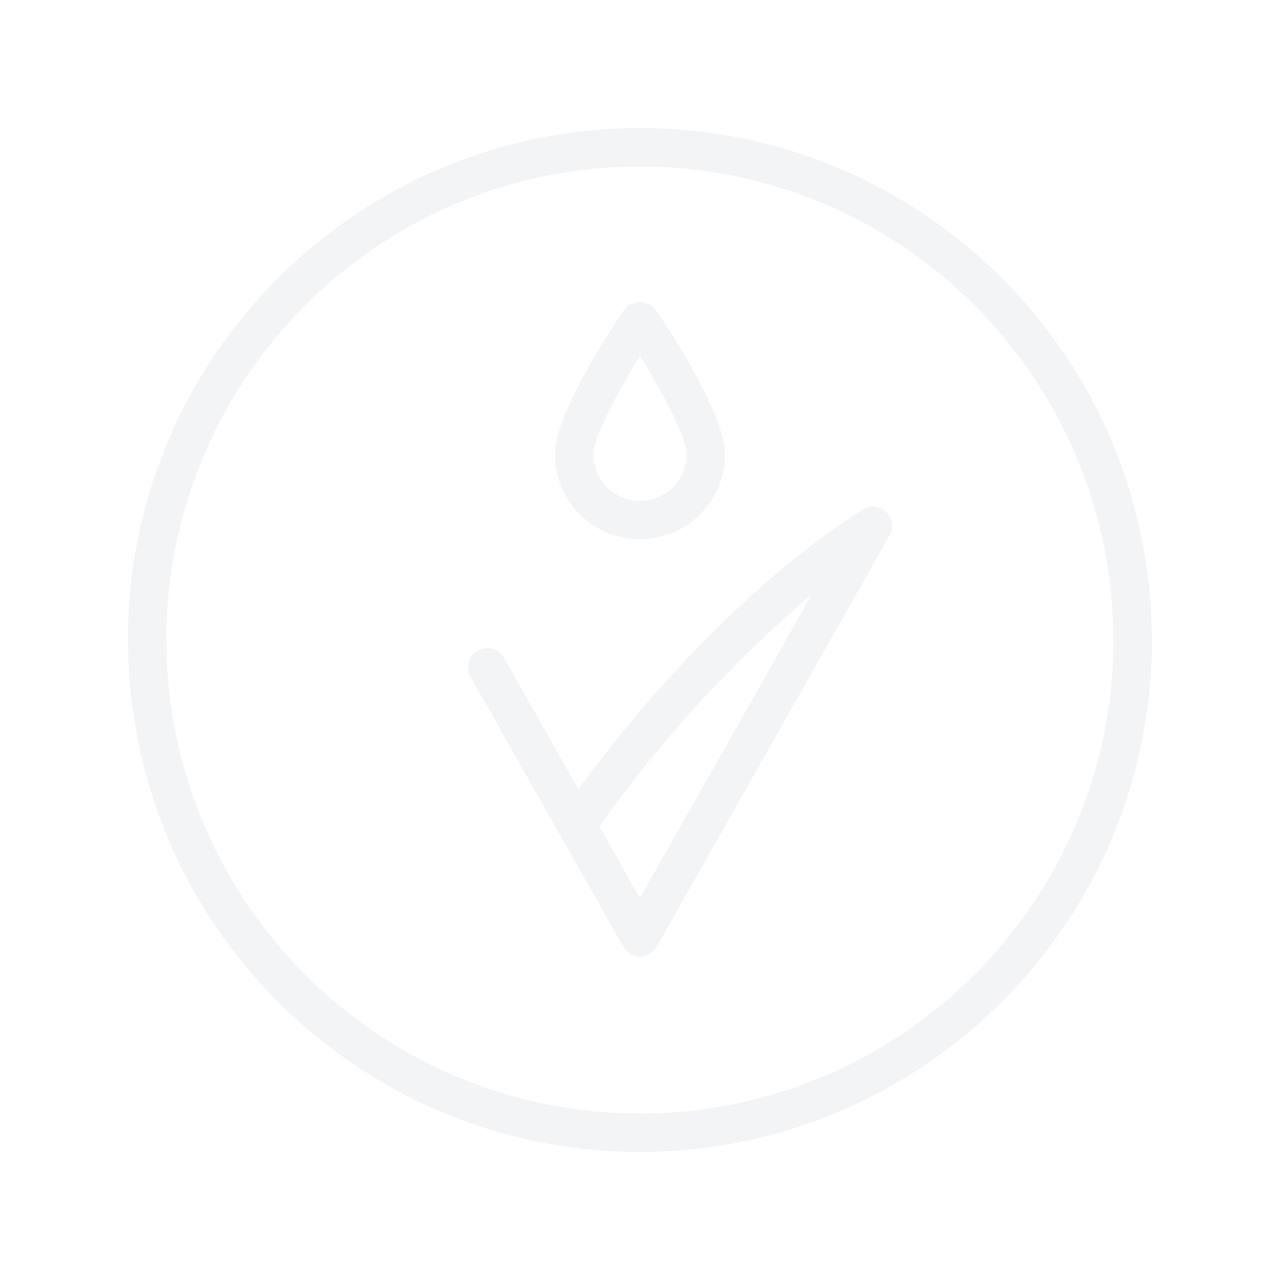 MUA Pixel Perfect Multi-Higlight Moonstone Shine подсветка лица 8.9g